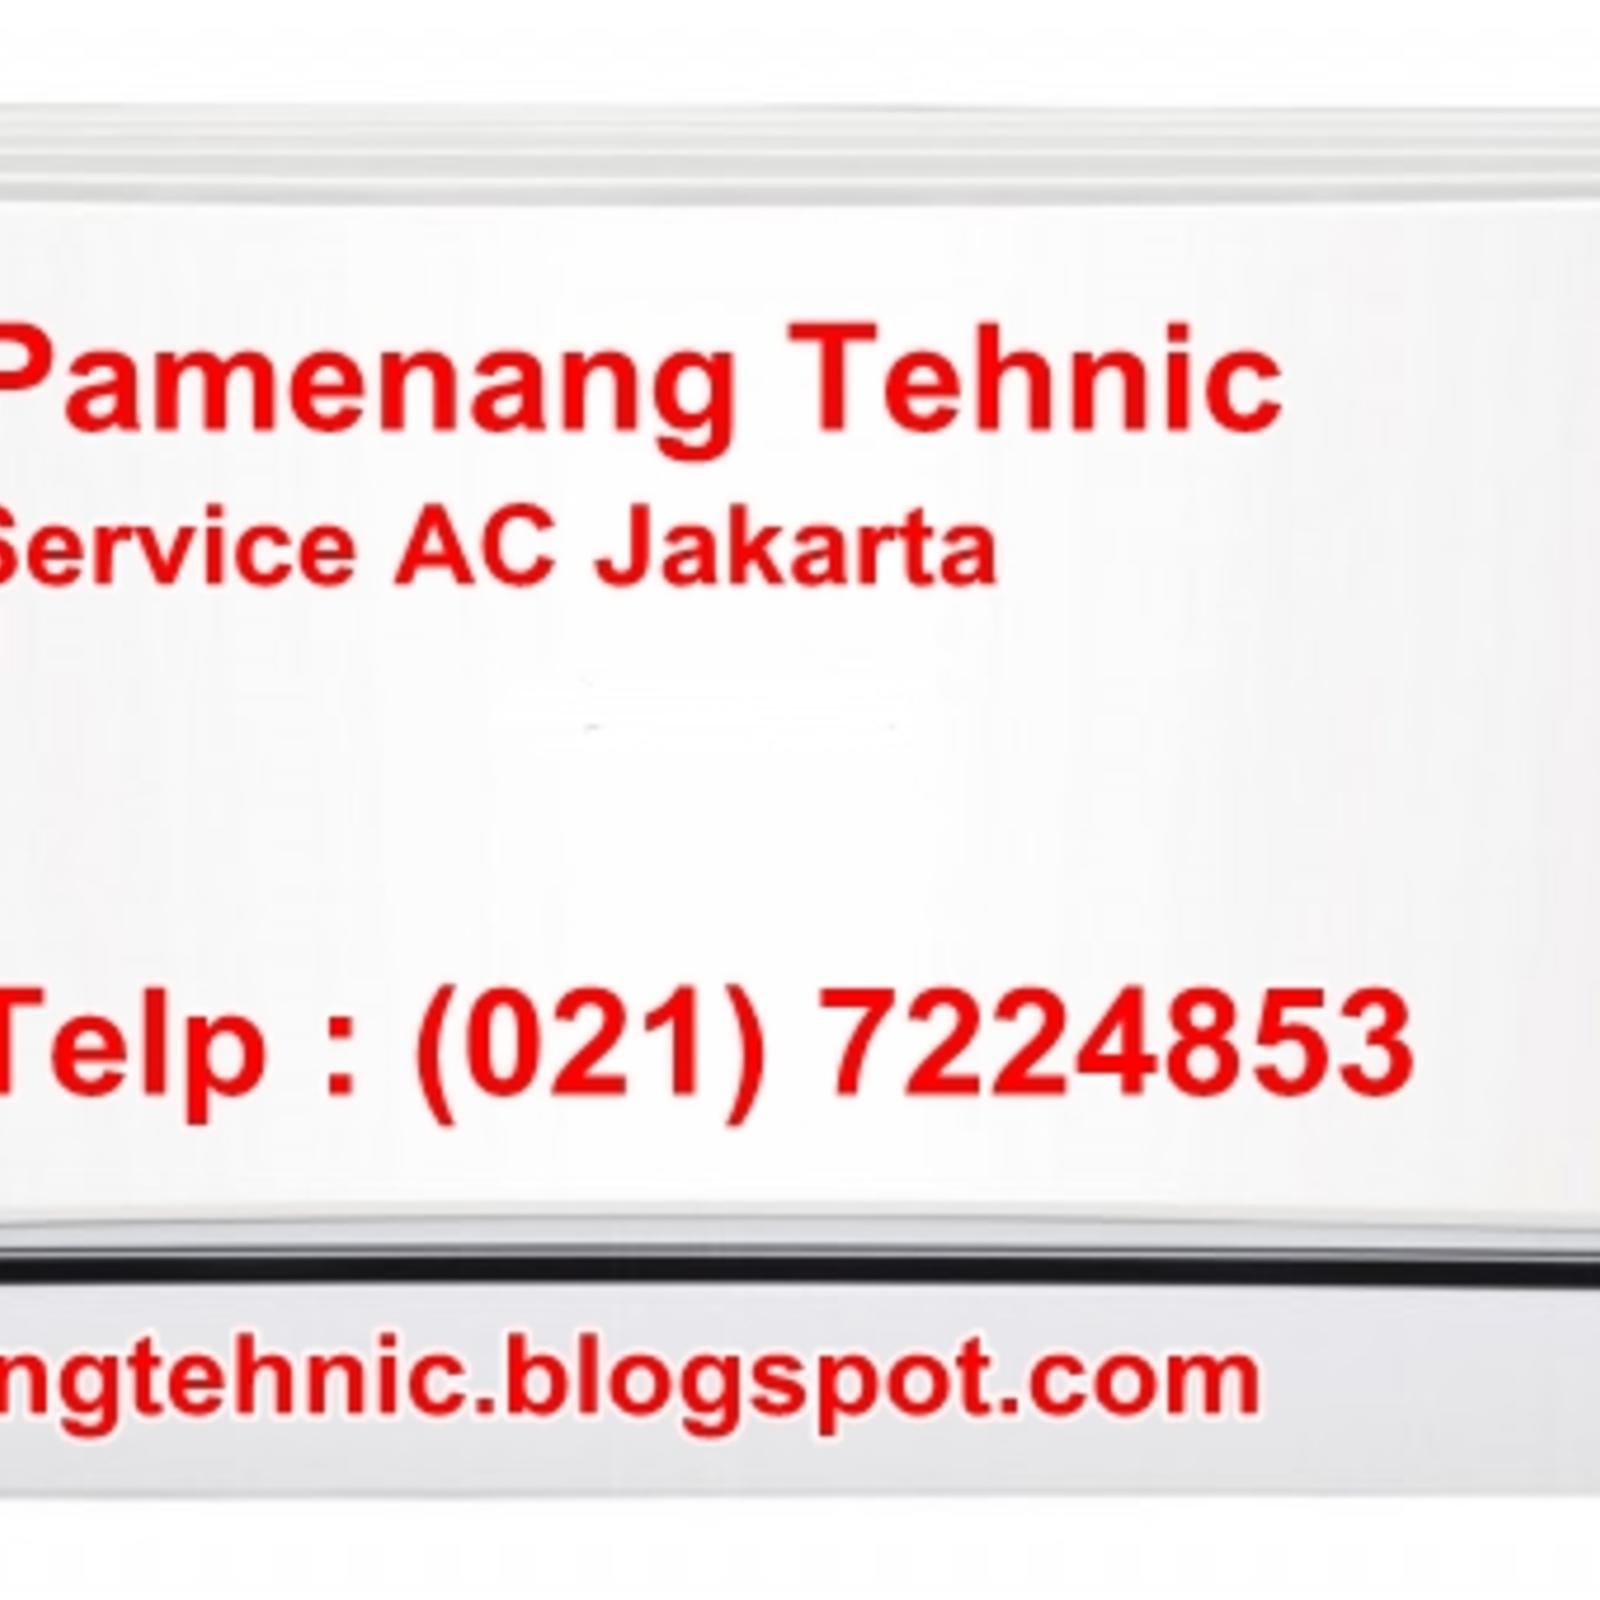 PAMENANG TEHNIC